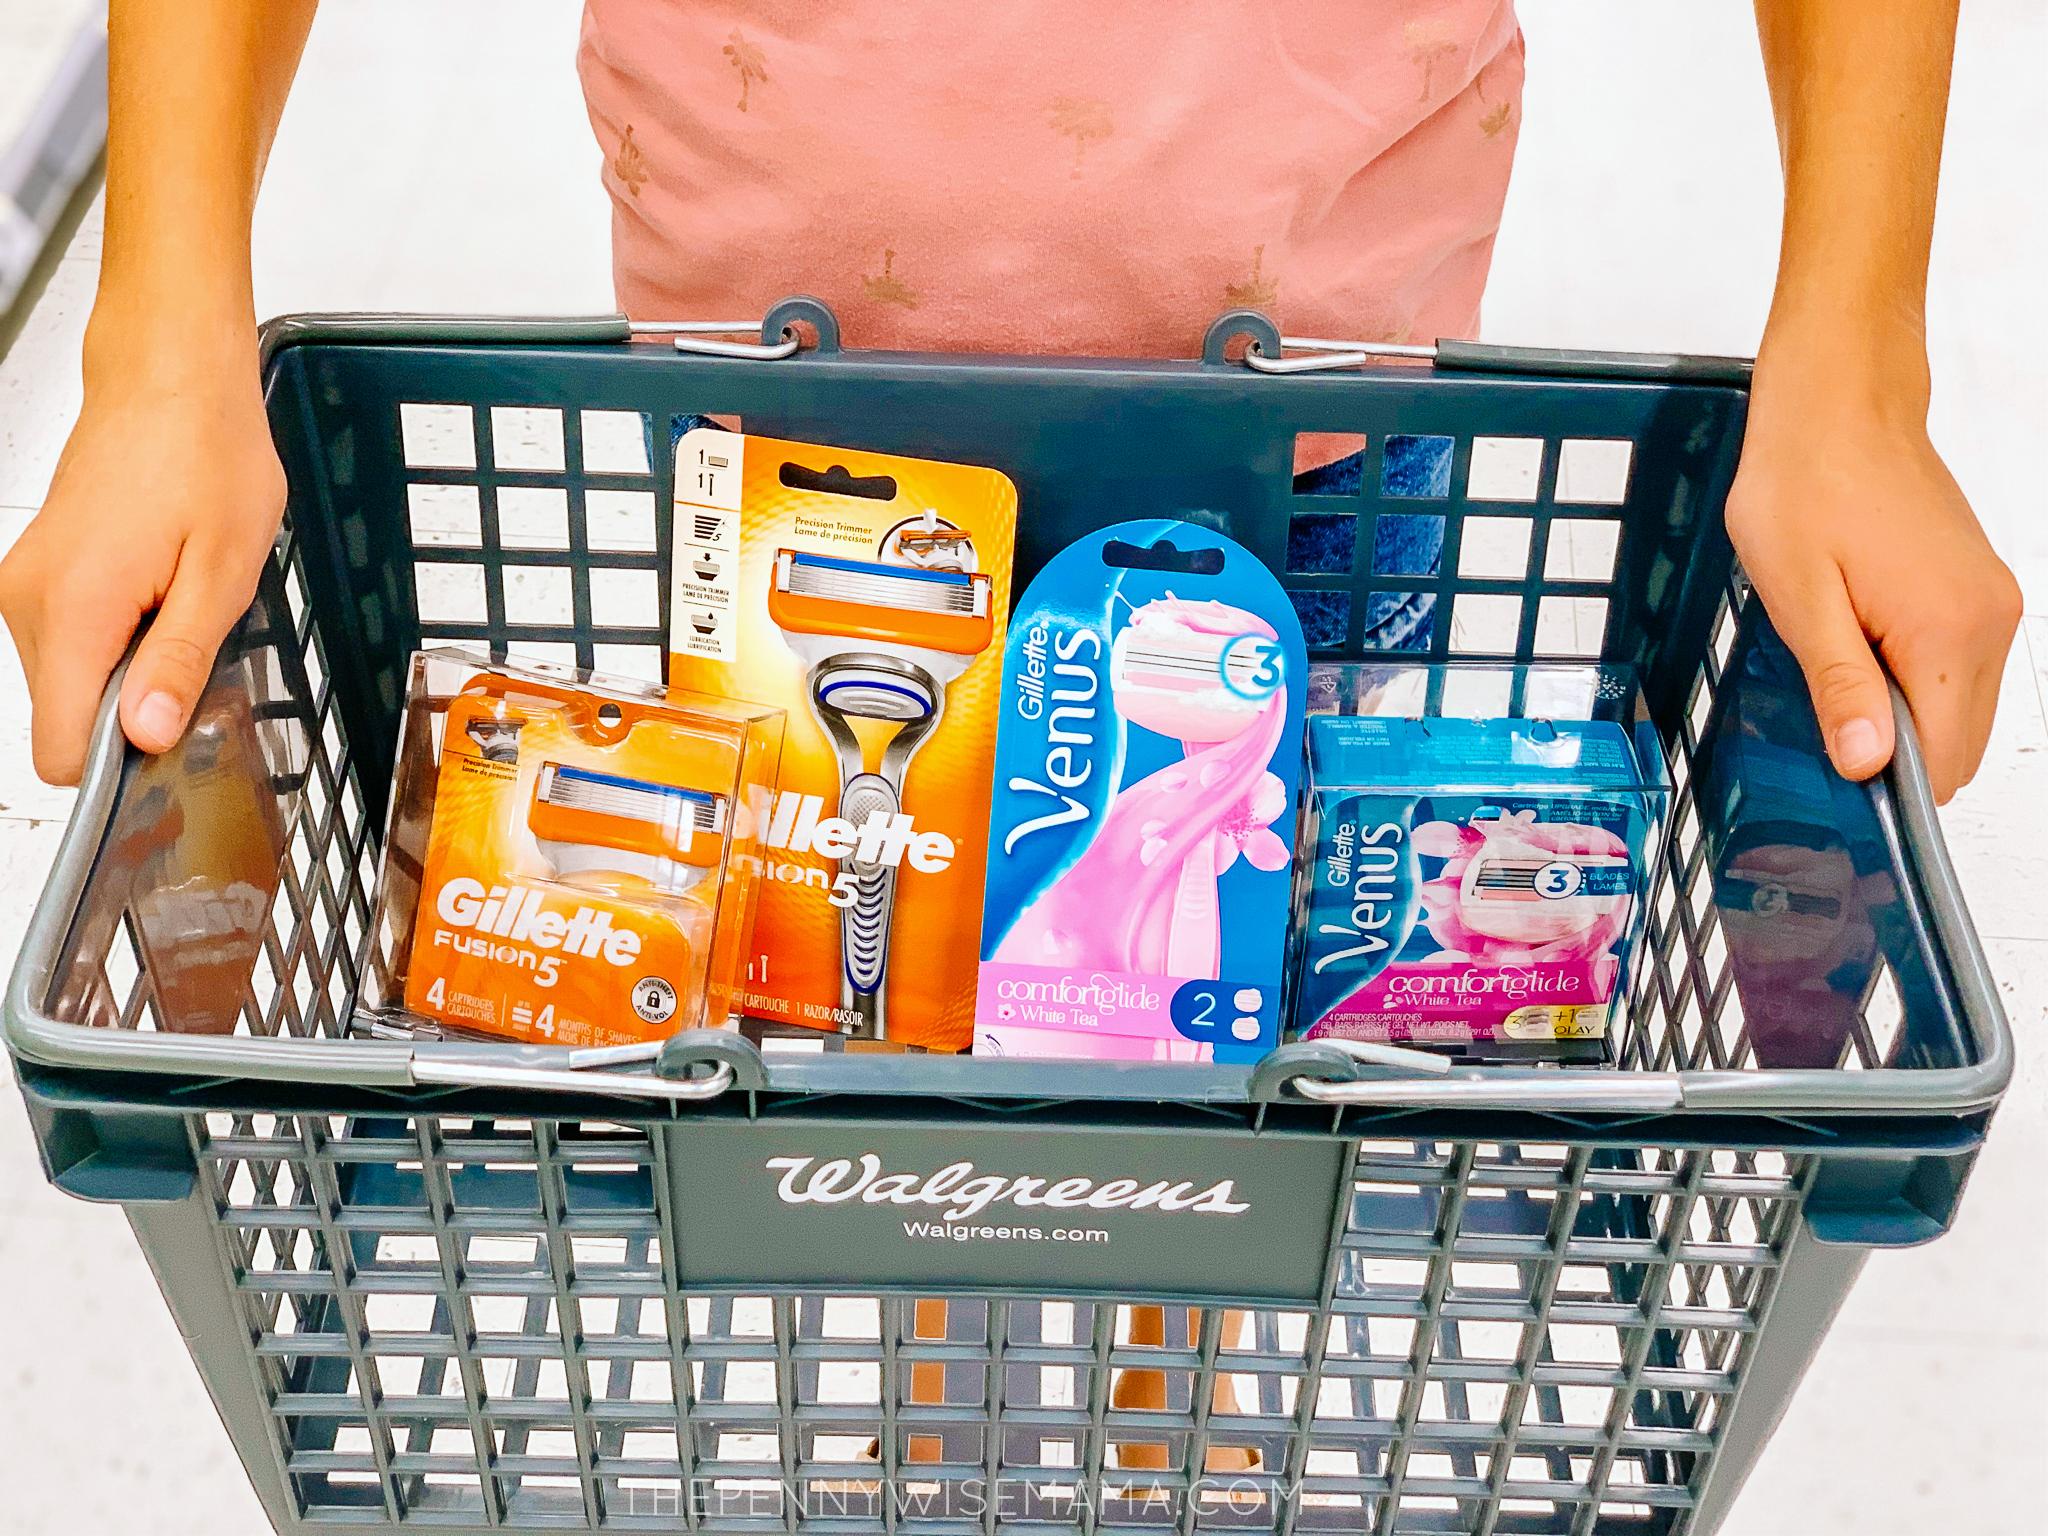 Save Big on Gillette Fusion 5 and Venus Razors at Walgreens